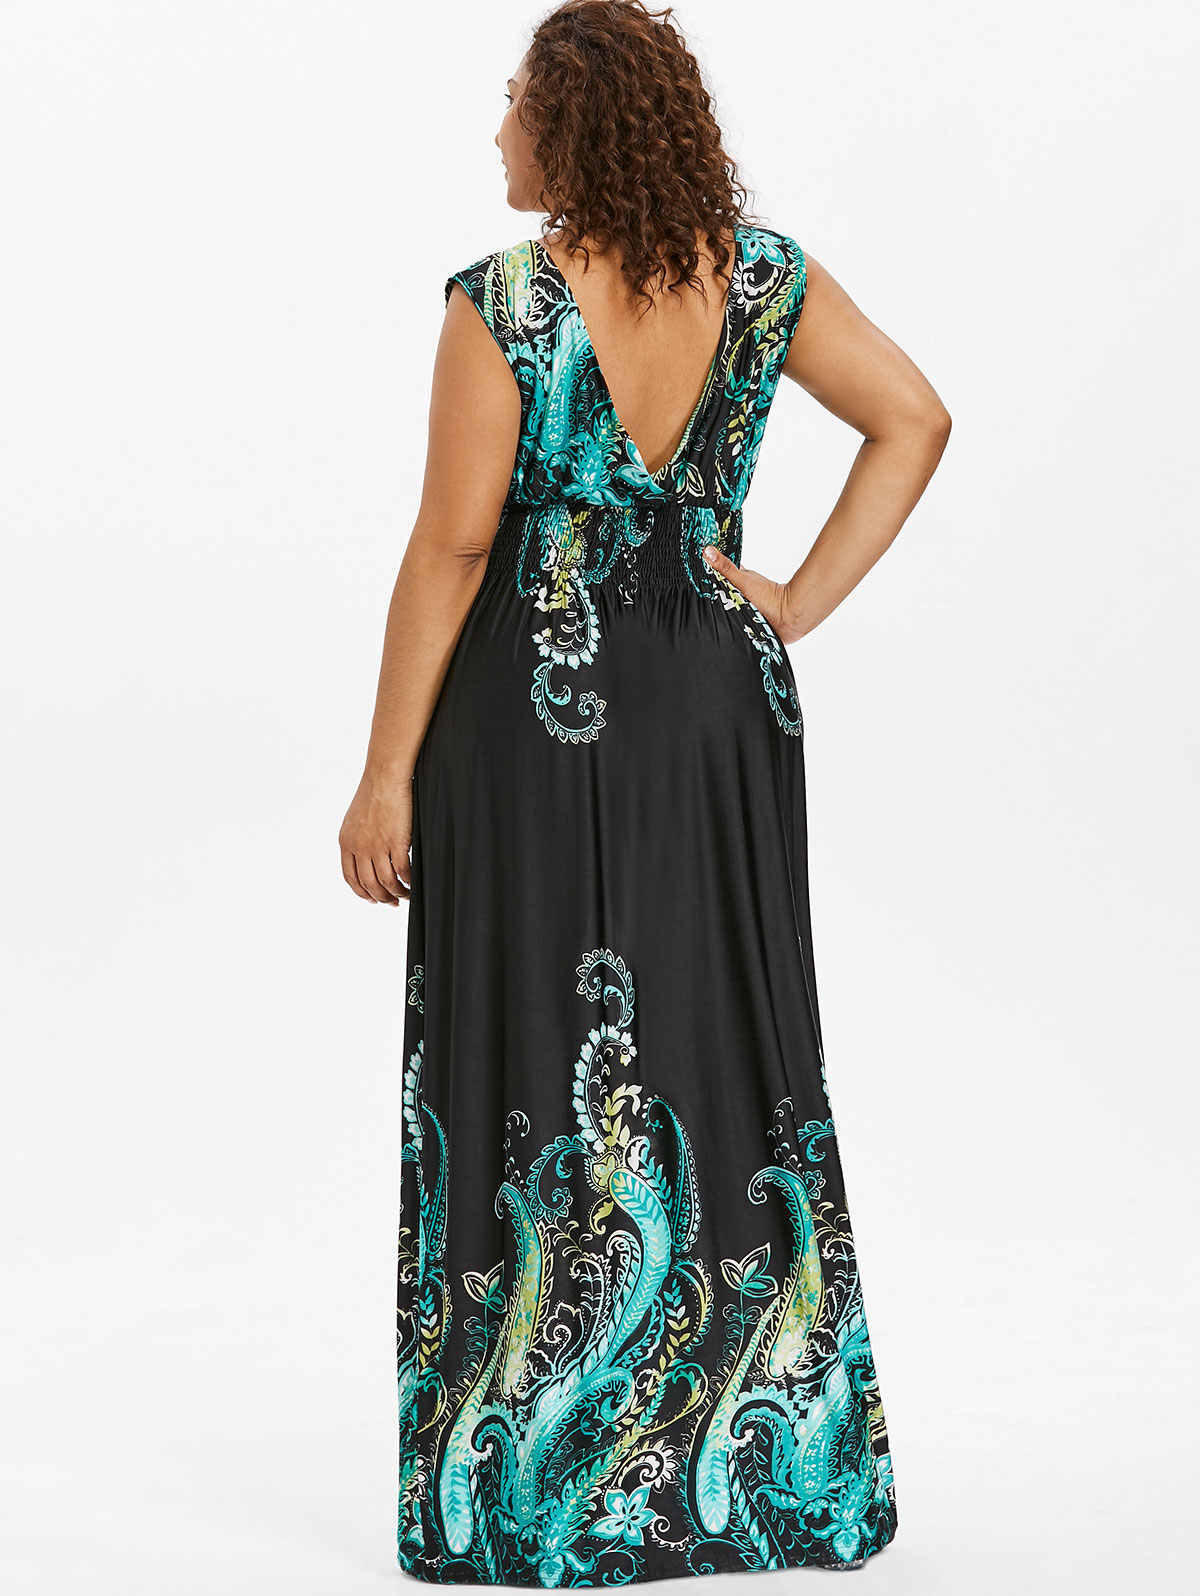 6865c0a9784 ... Wipalo Summer Paisley Plunge V Neck Bohemian Plus Size Women Dress  Casual Beach Maxi Dress Big ...